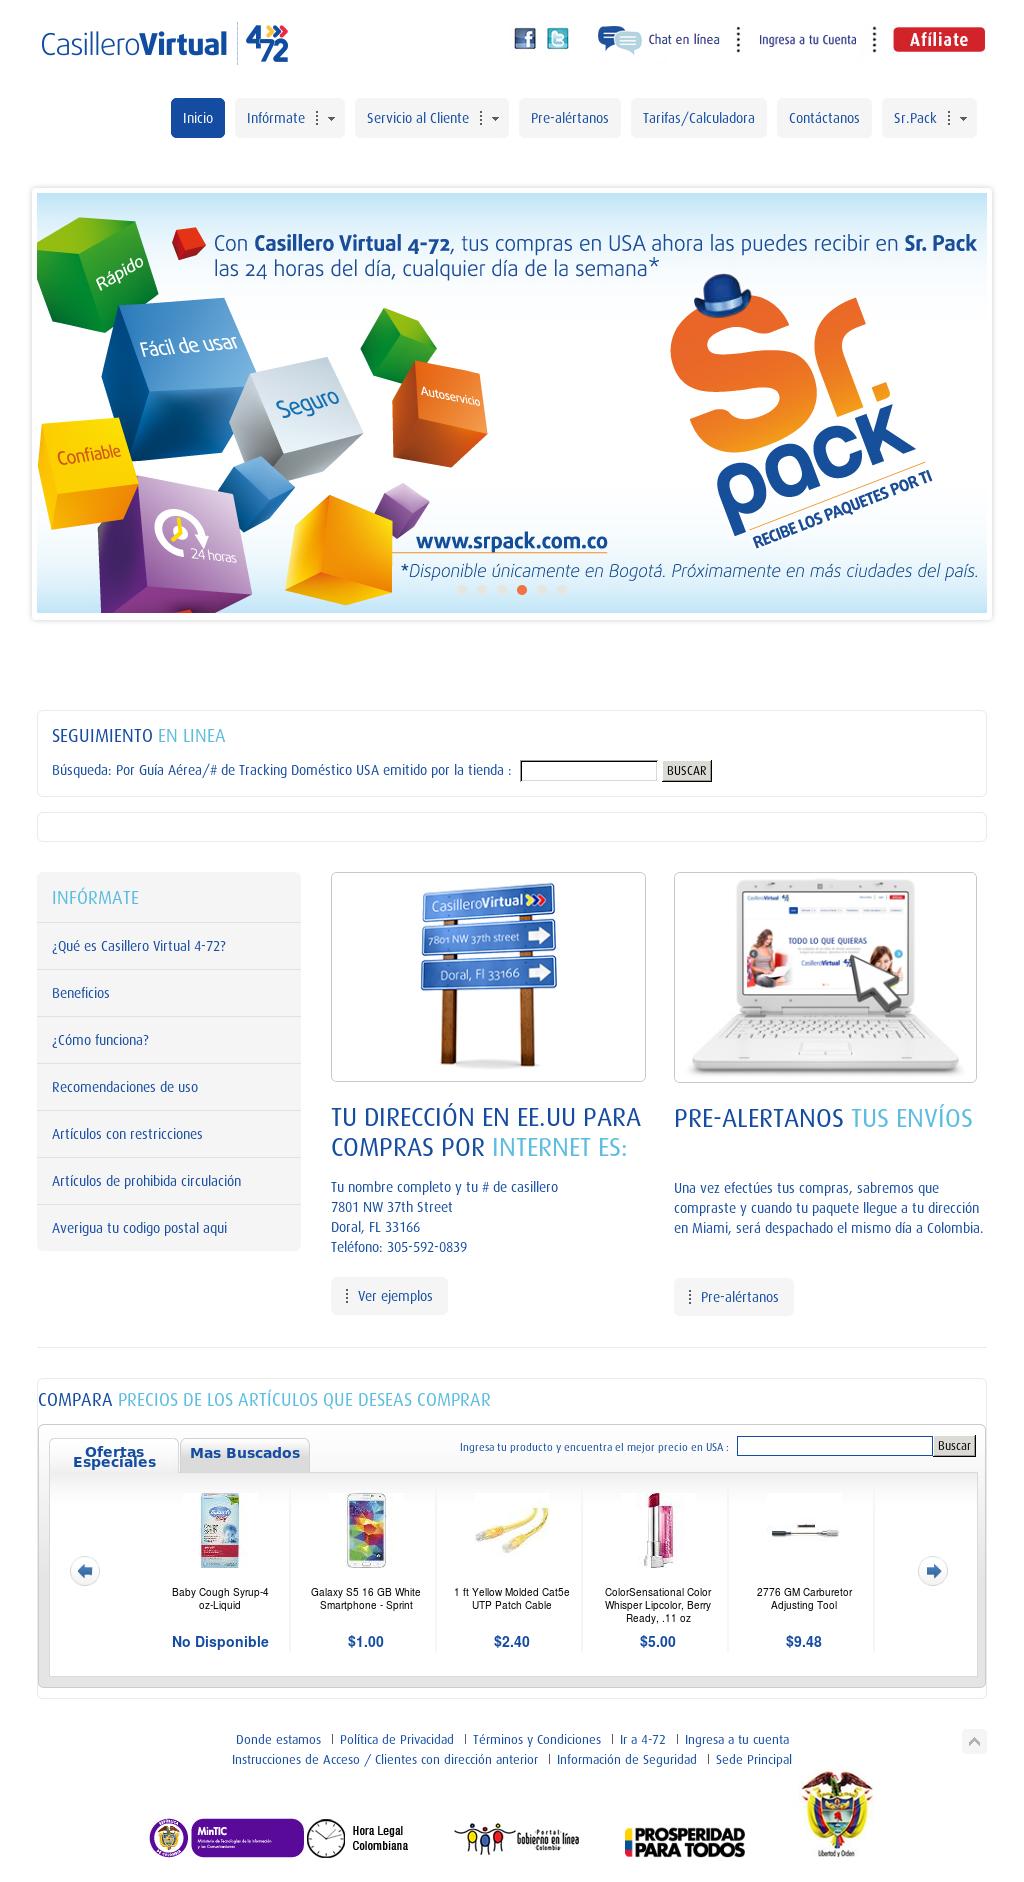 Casillero Virtual 4-72 Competitors, Revenue and Employees